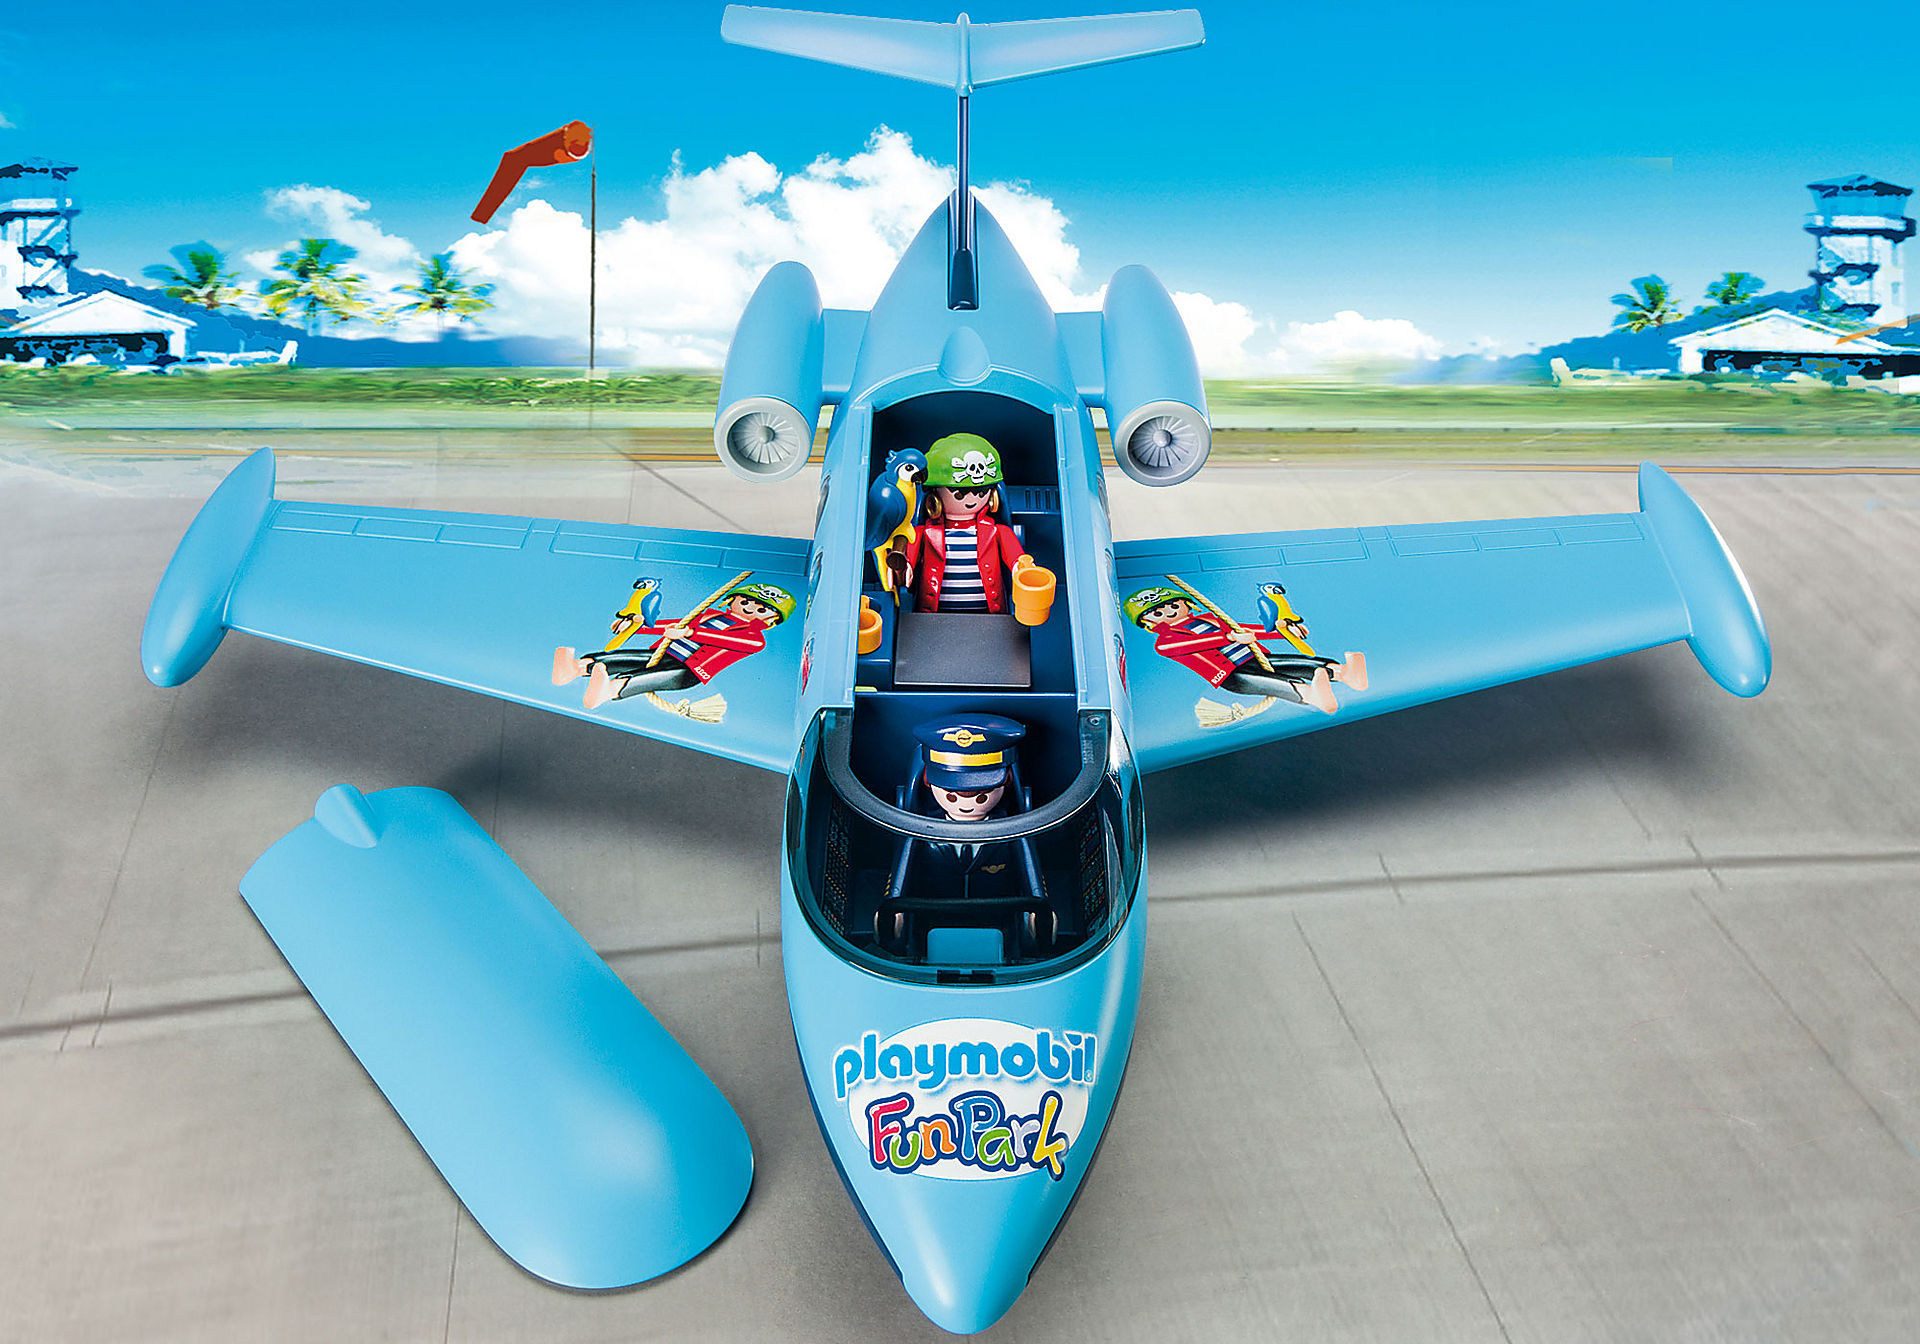 9366 PLAYMOBIL-FunPark Summer Jet zoom image5